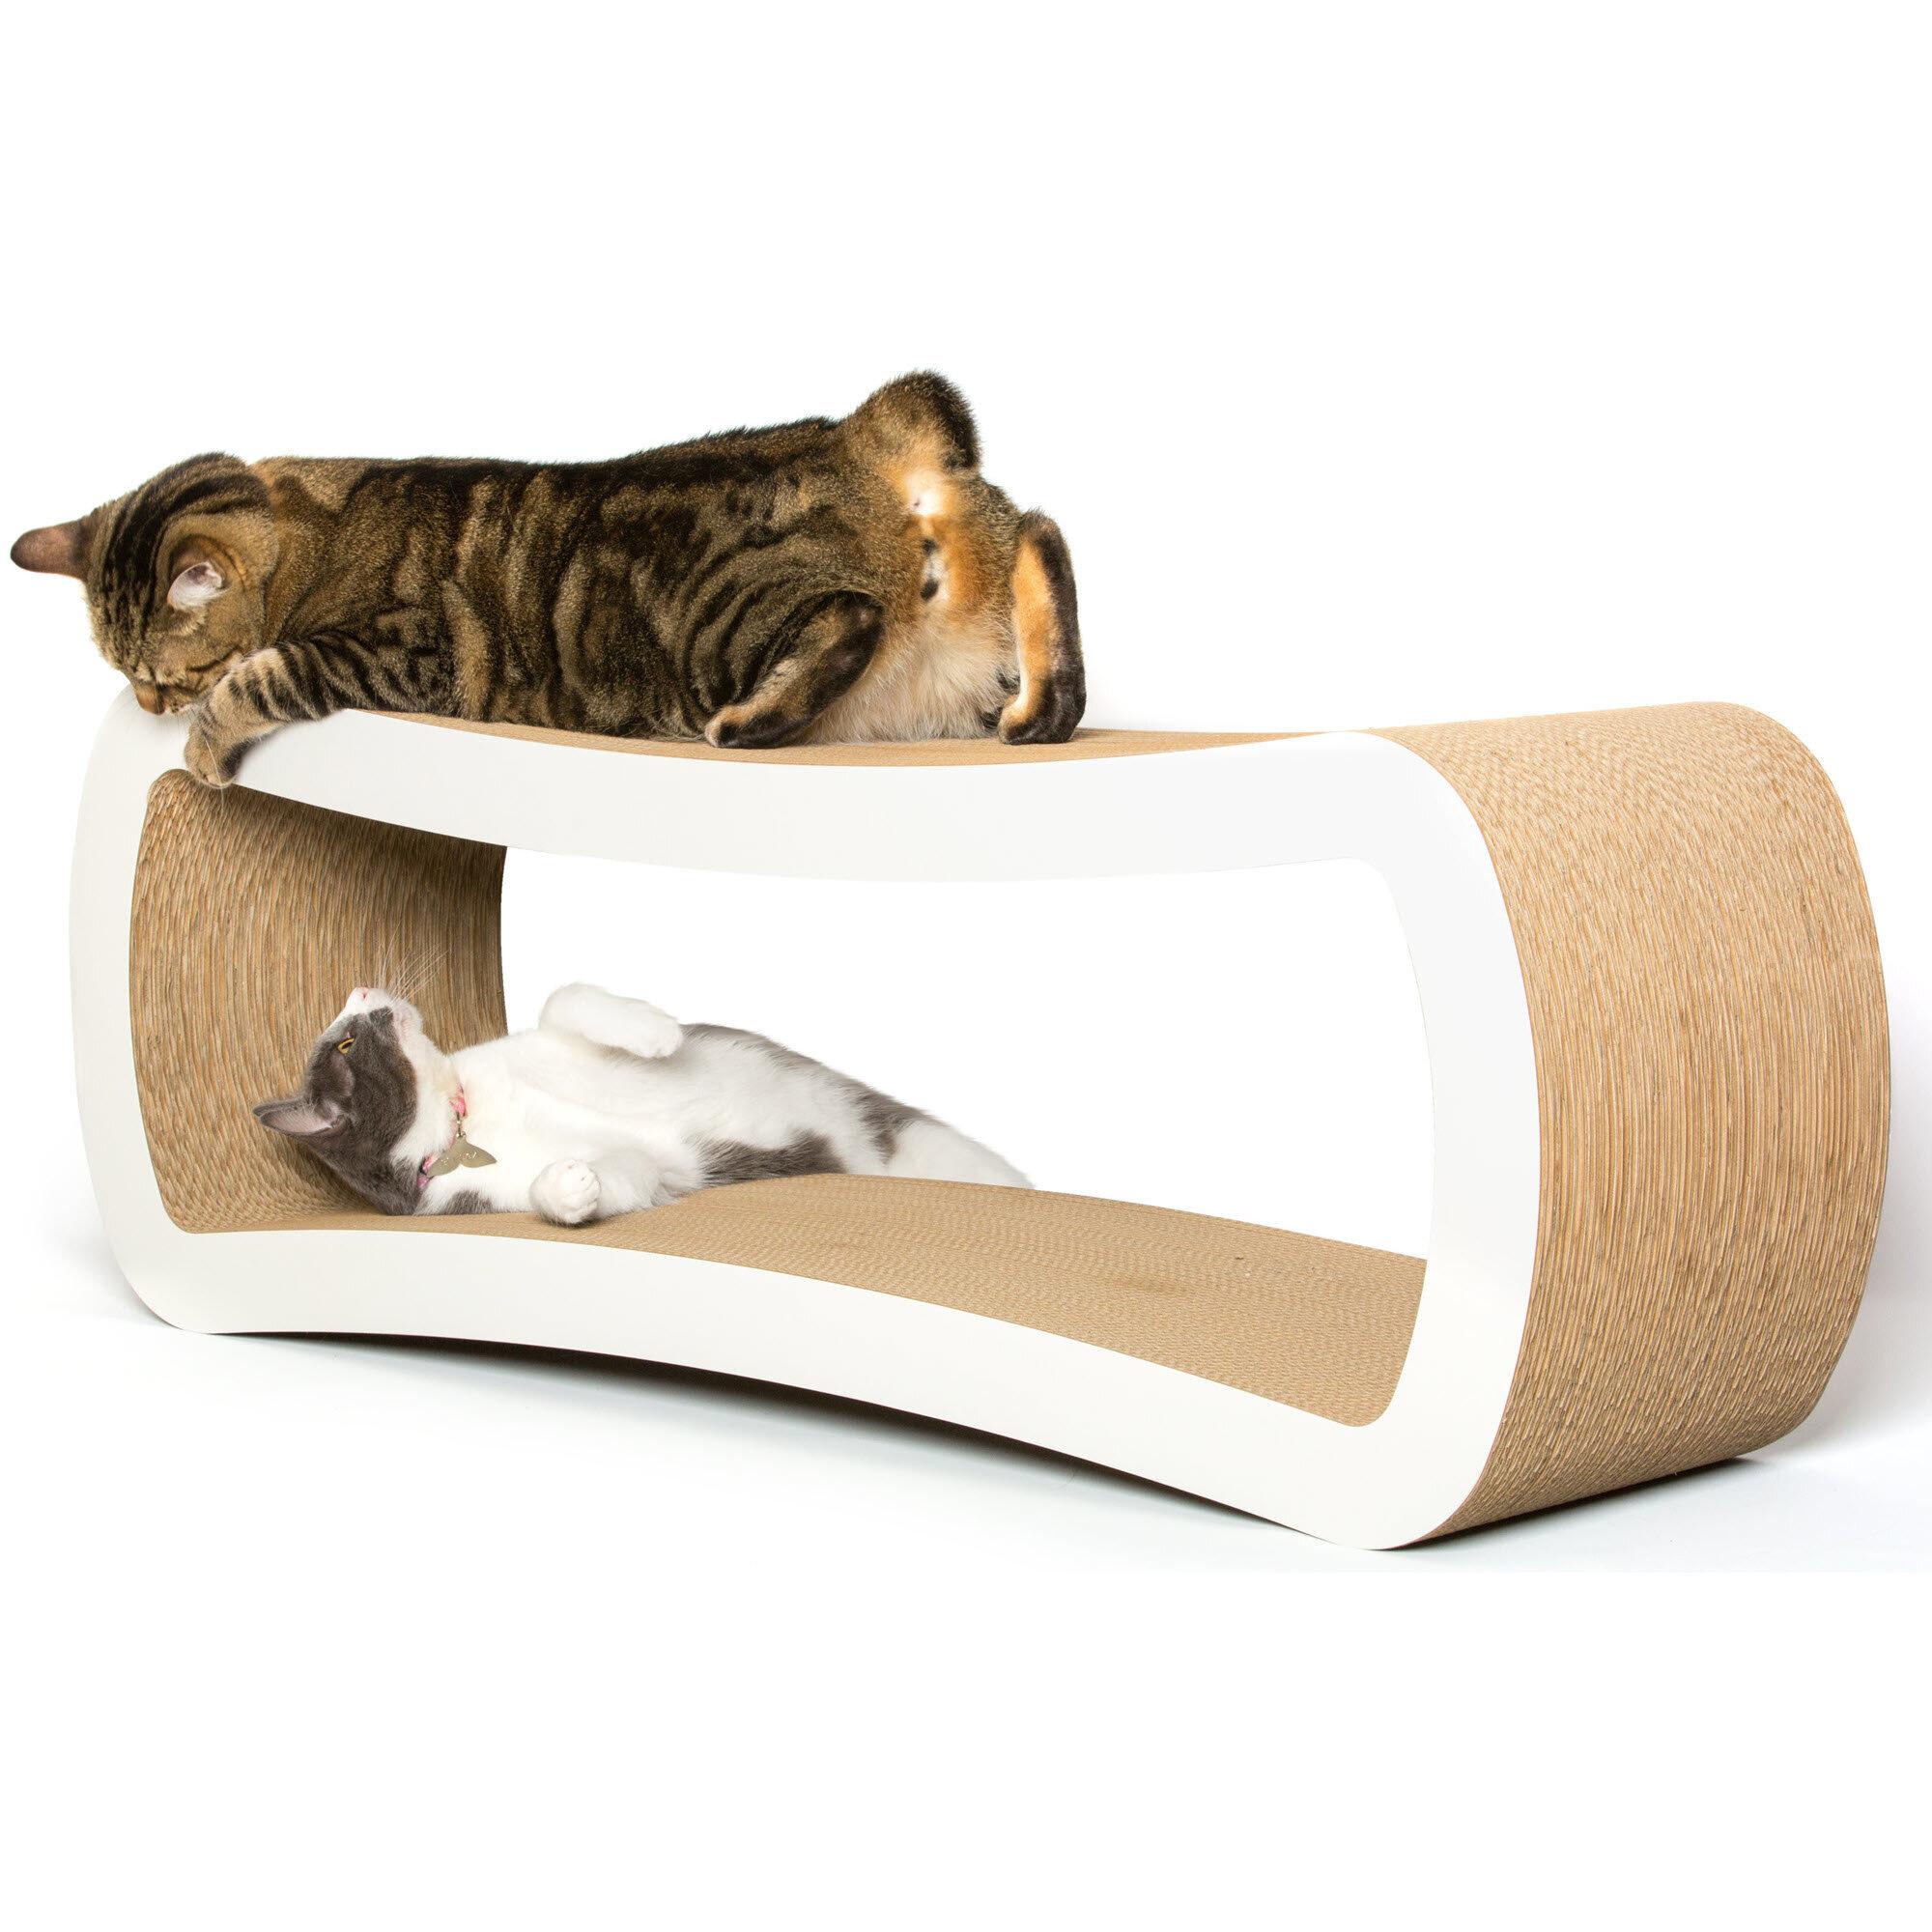 Darrell Jumbo Cat Scratcher Lounge & Bed